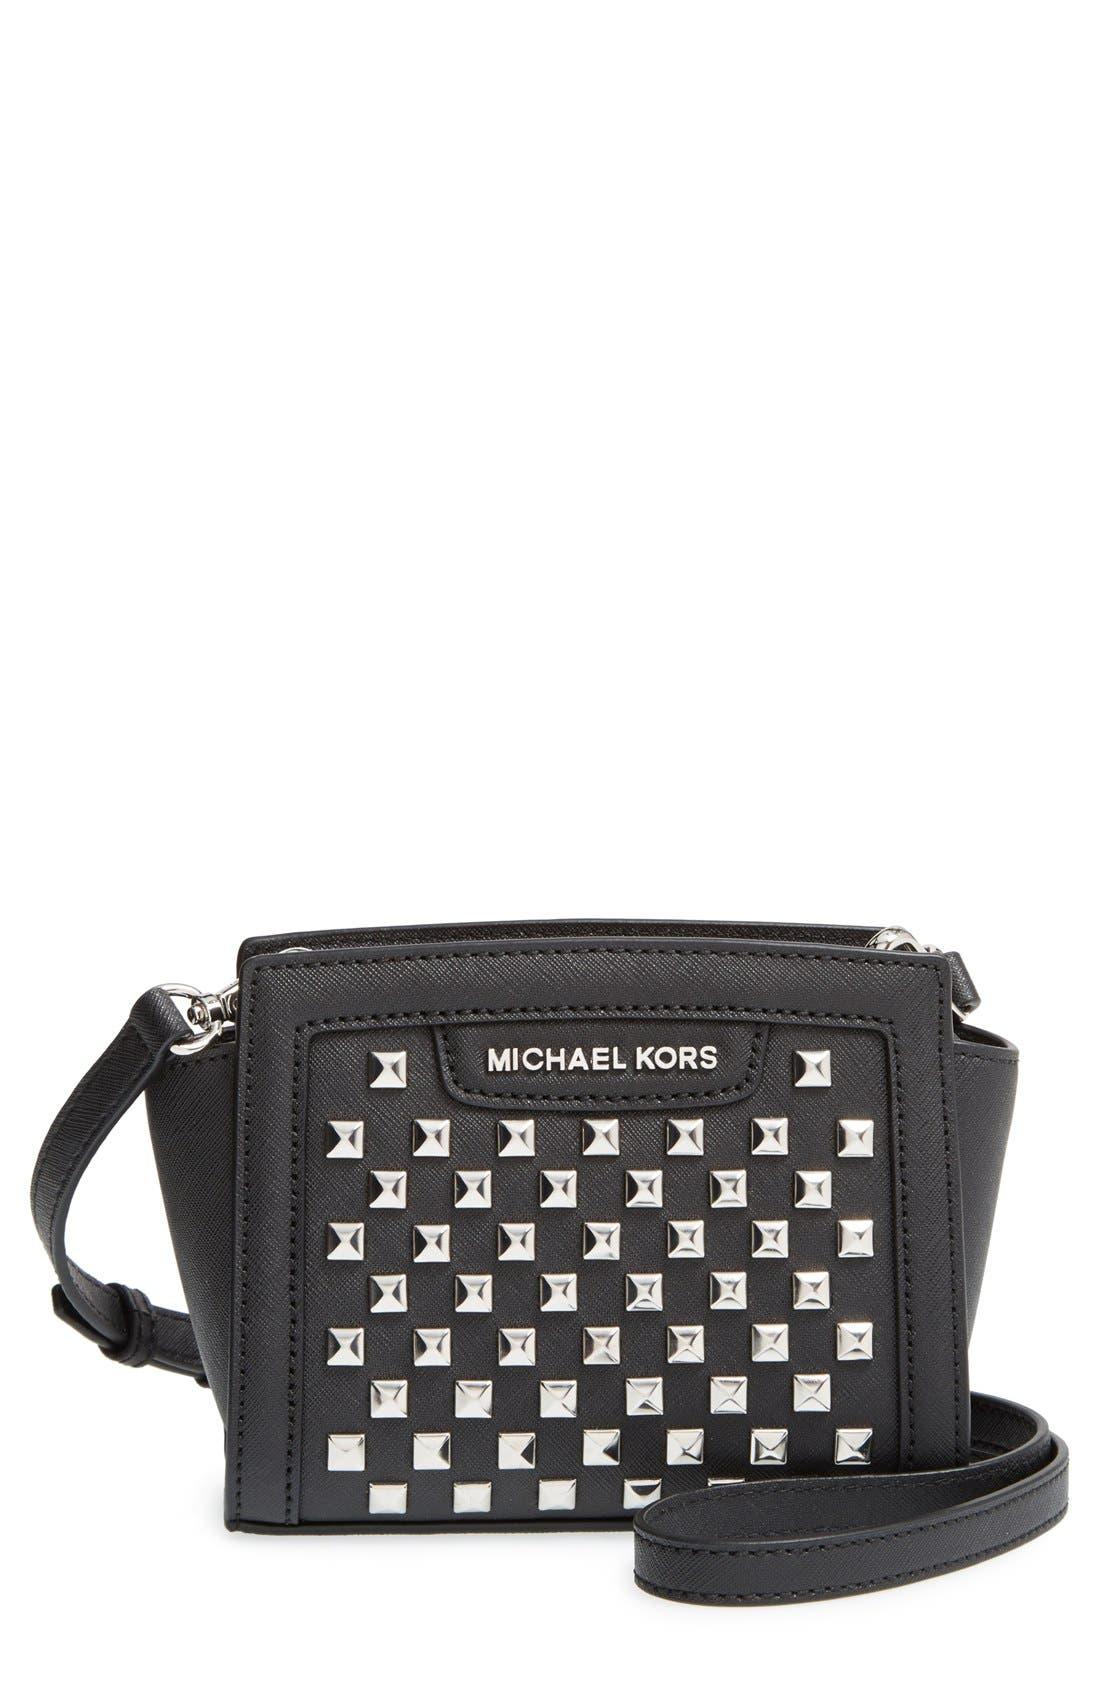 Main Image - MICHAEL Michael Kors 'Mini Selma' Studded Saffiano Leather Crossbody Bag